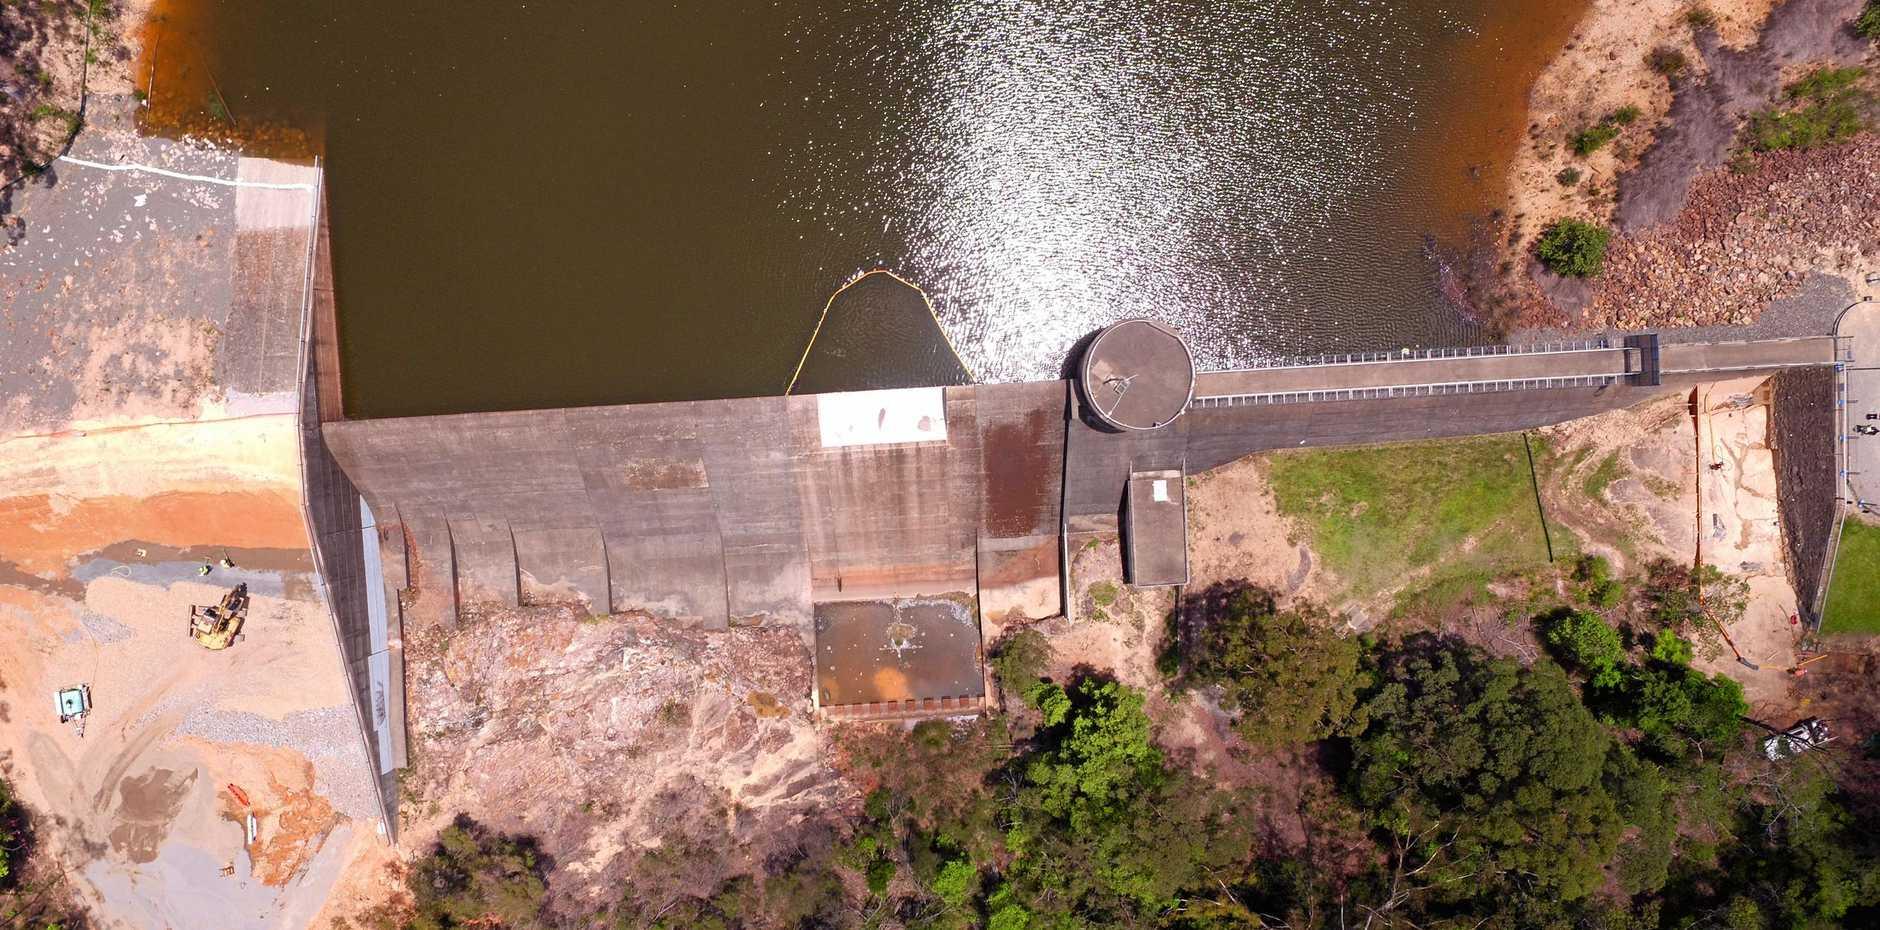 Cooloolabin Dam spillway during upgrade works.